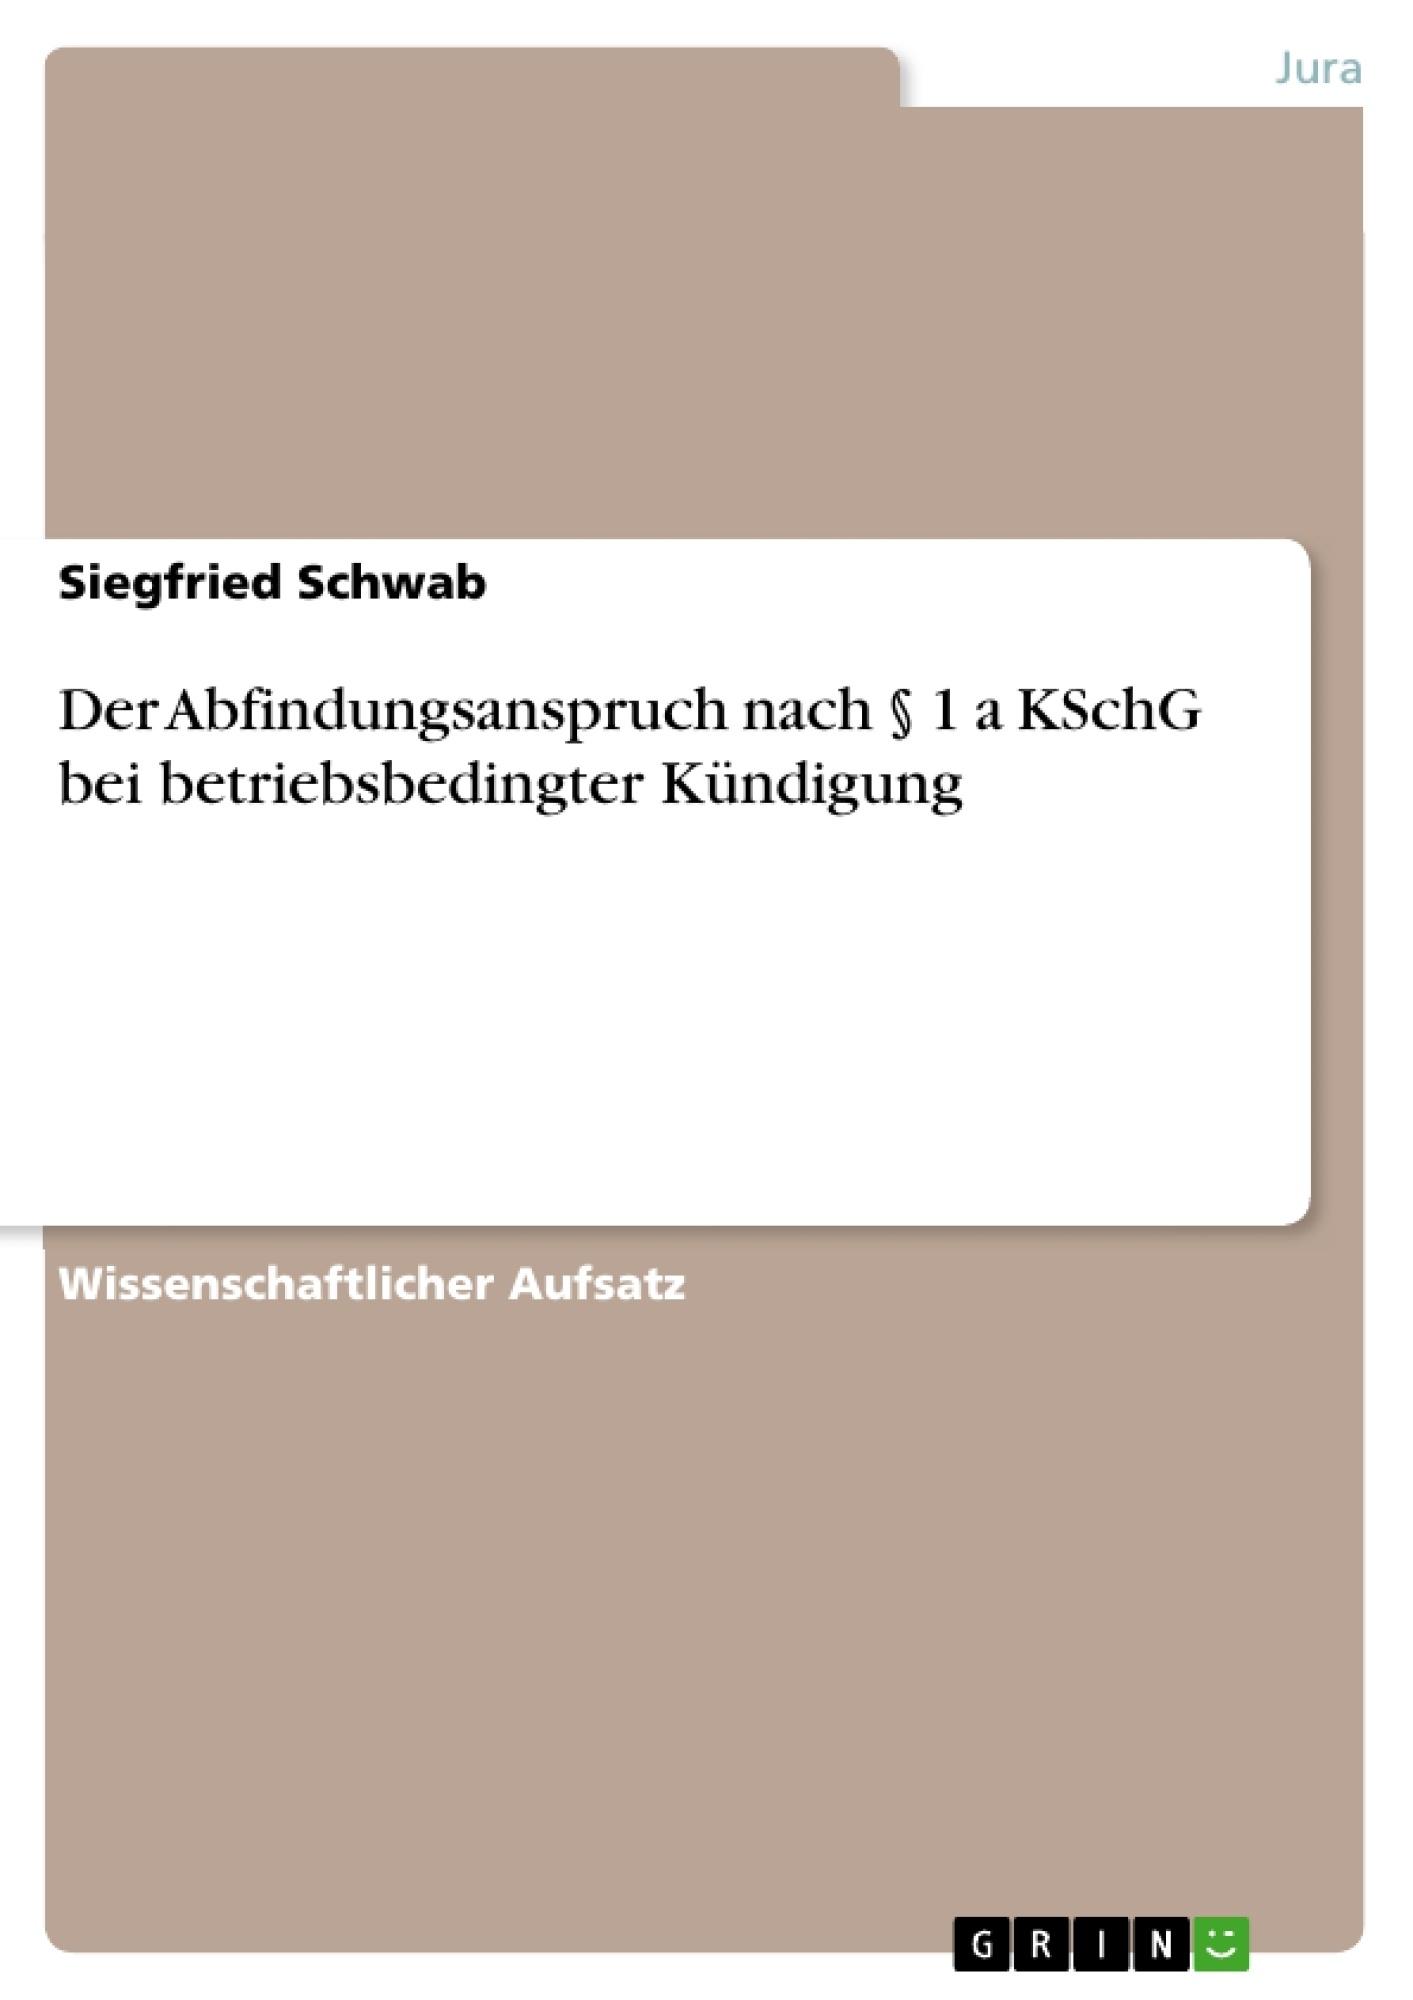 Titel: Der Abfindungsanspruch nach § 1 a KSchG bei betriebsbedingter Kündigung